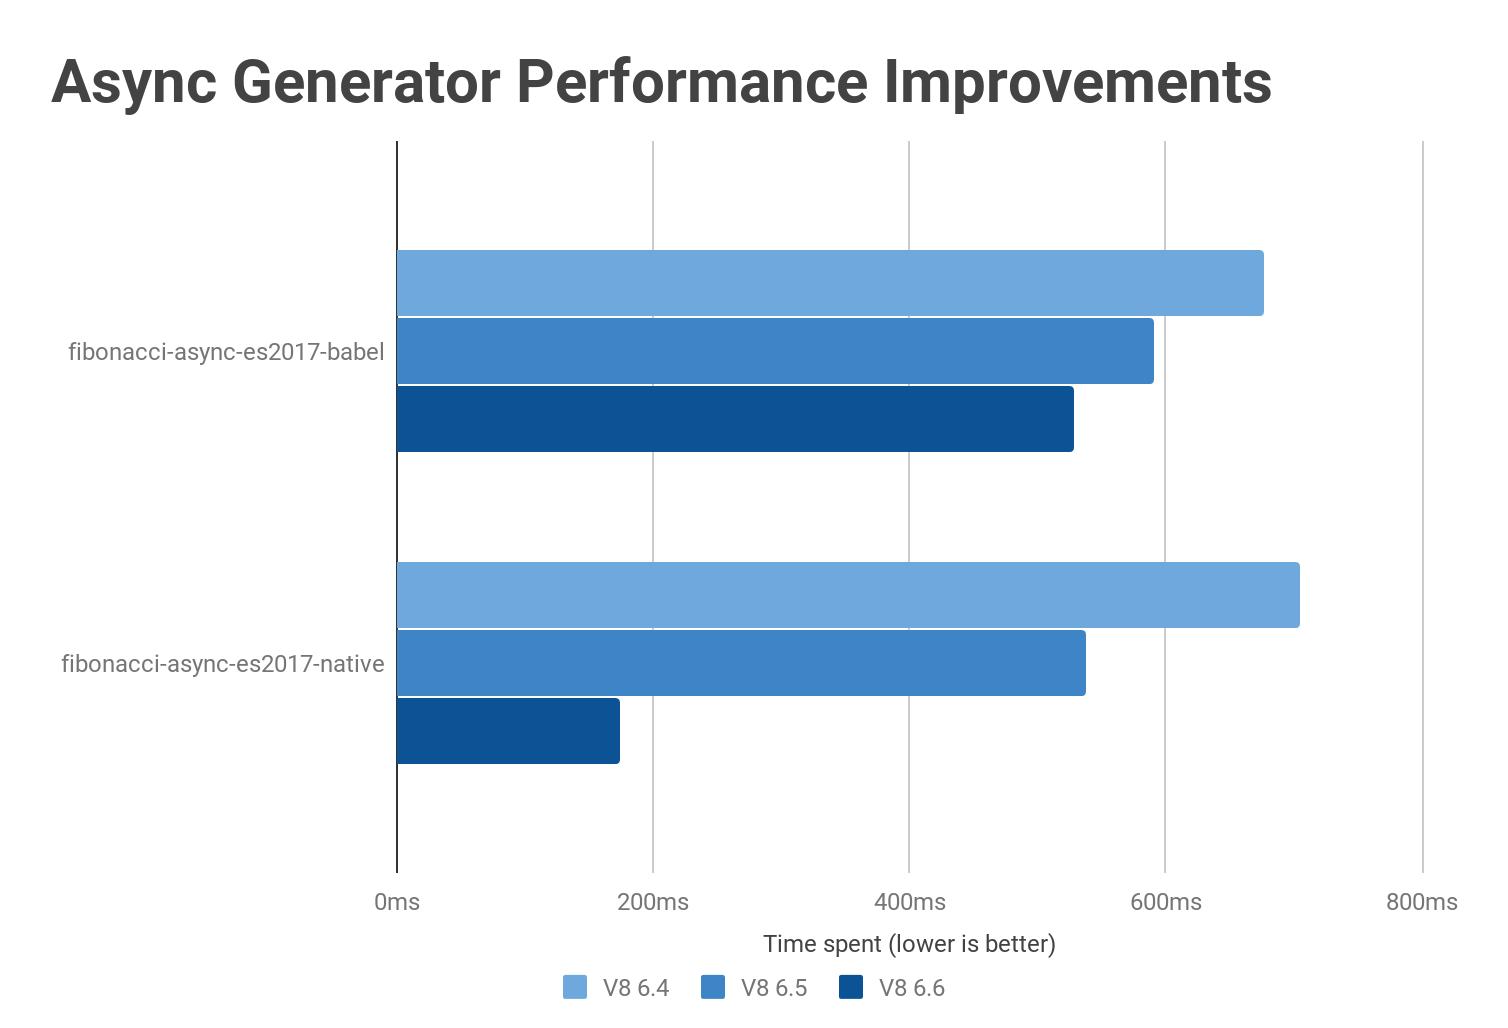 Async generators performance improvements